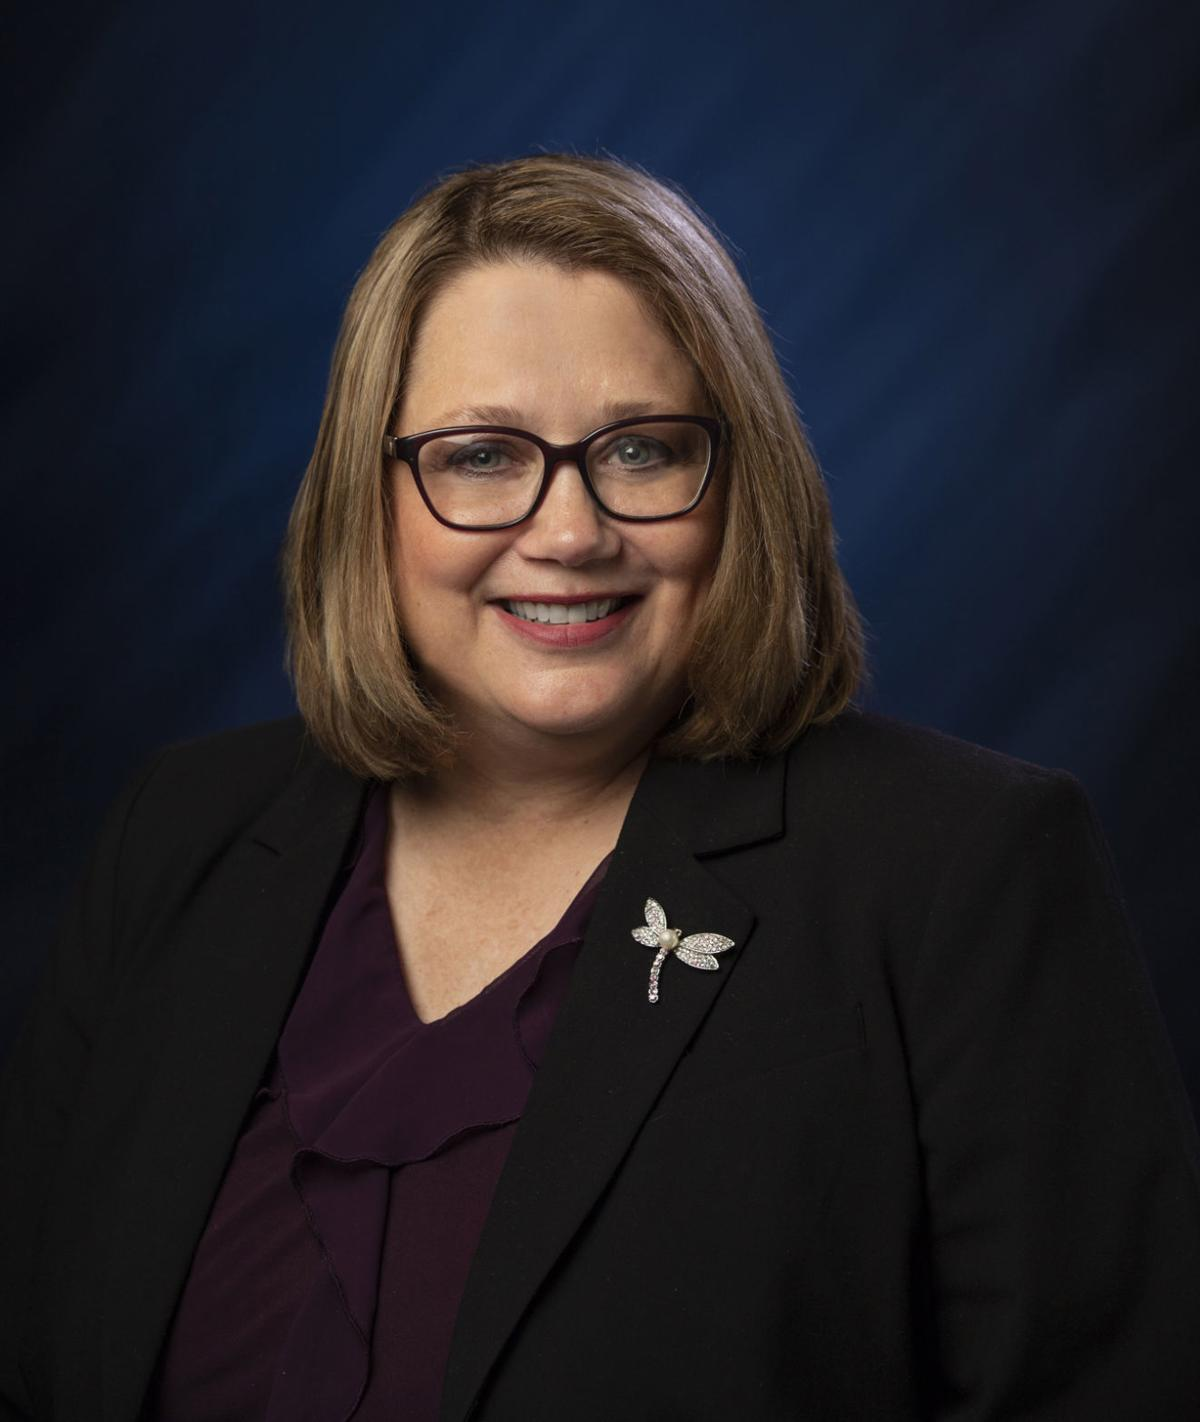 State Rep. Lisa Beck, D-Hebron